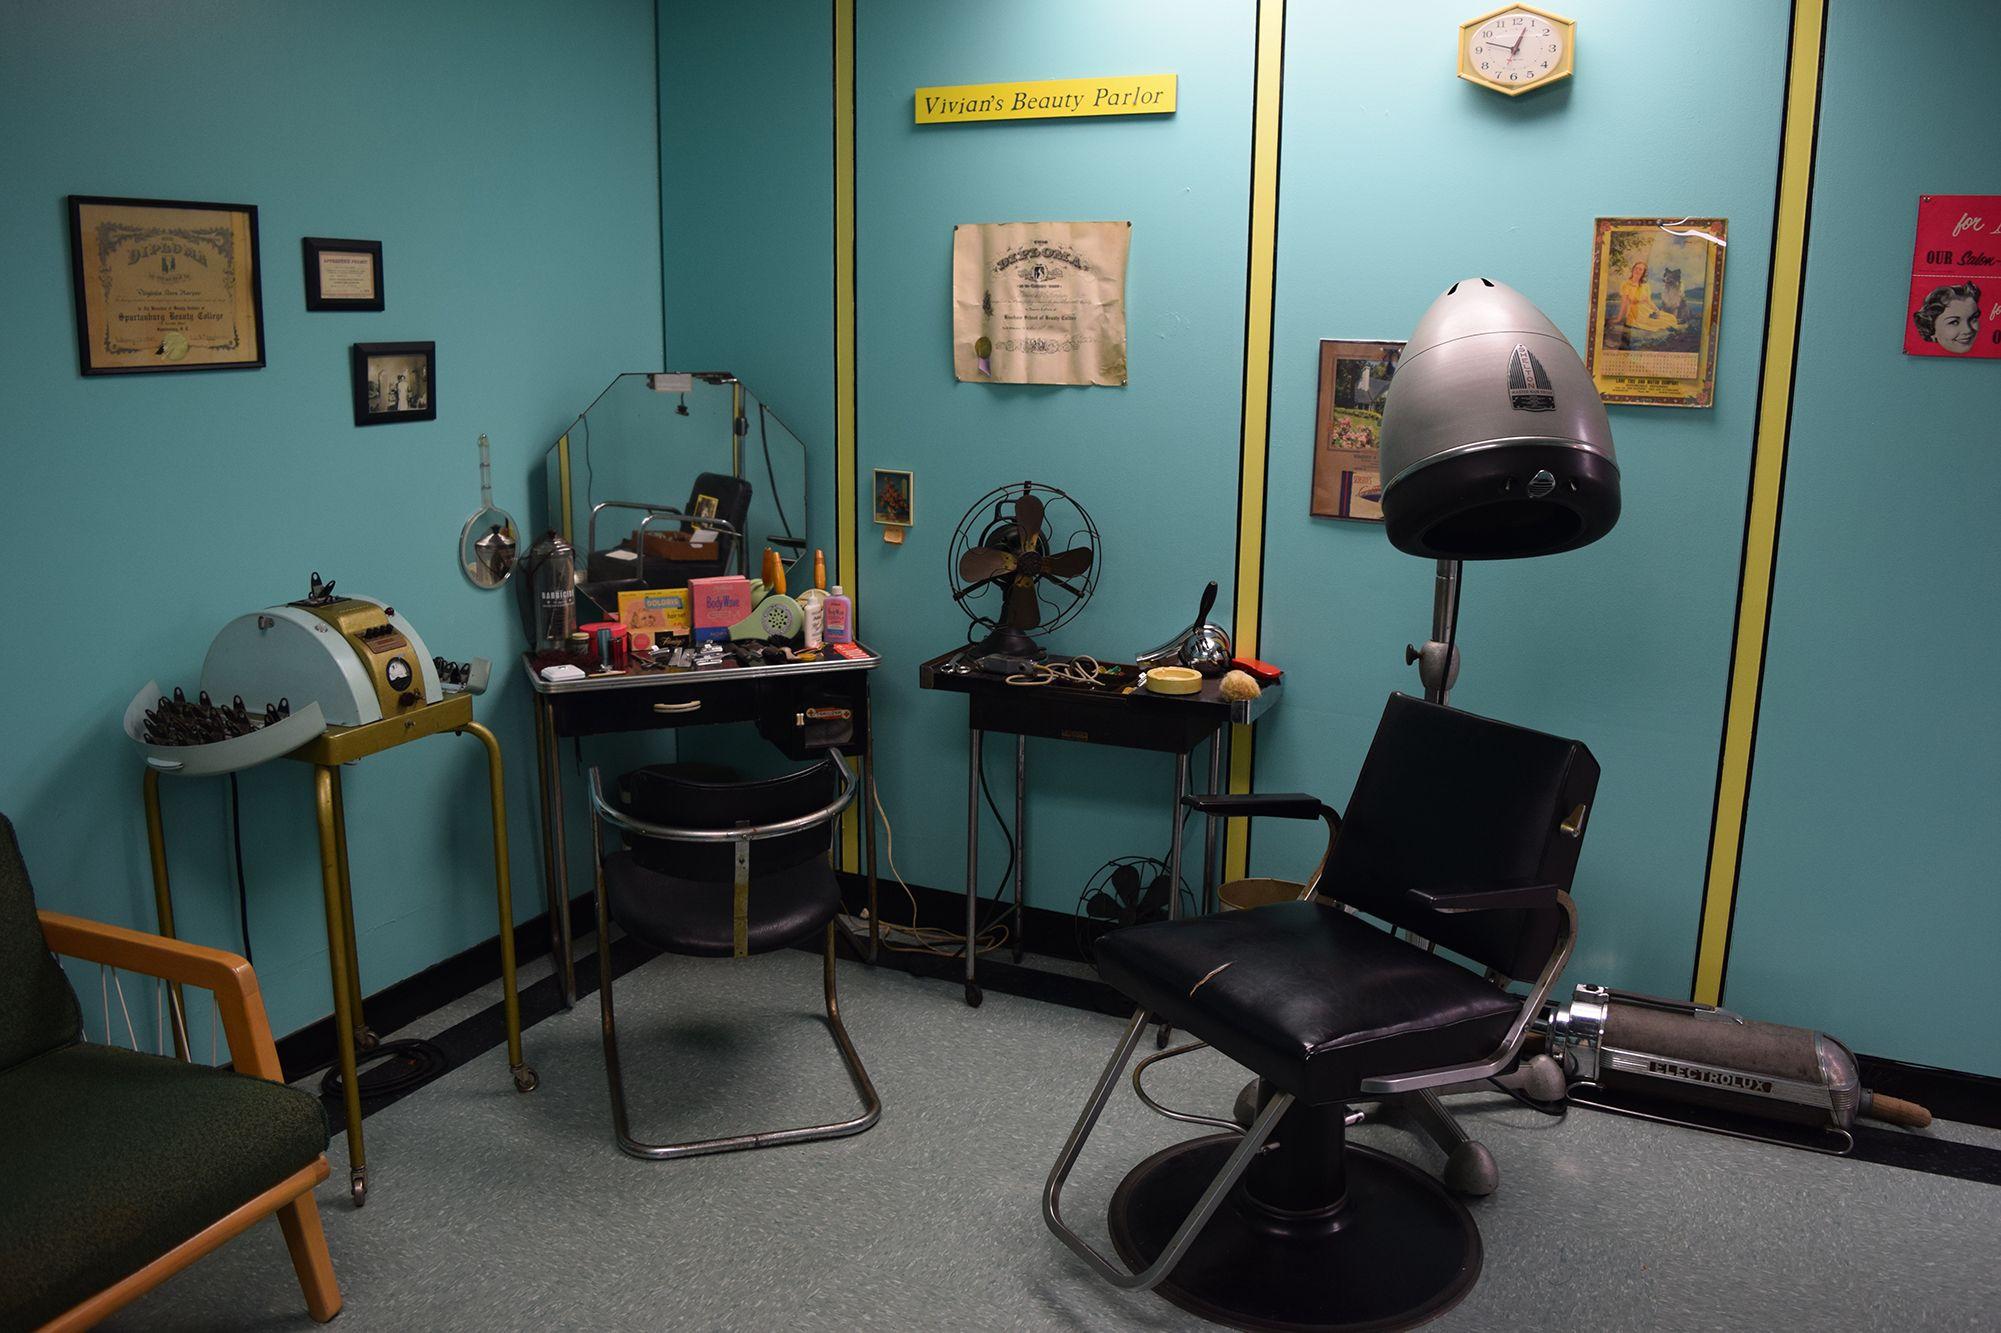 Vivian's Beauty Shop